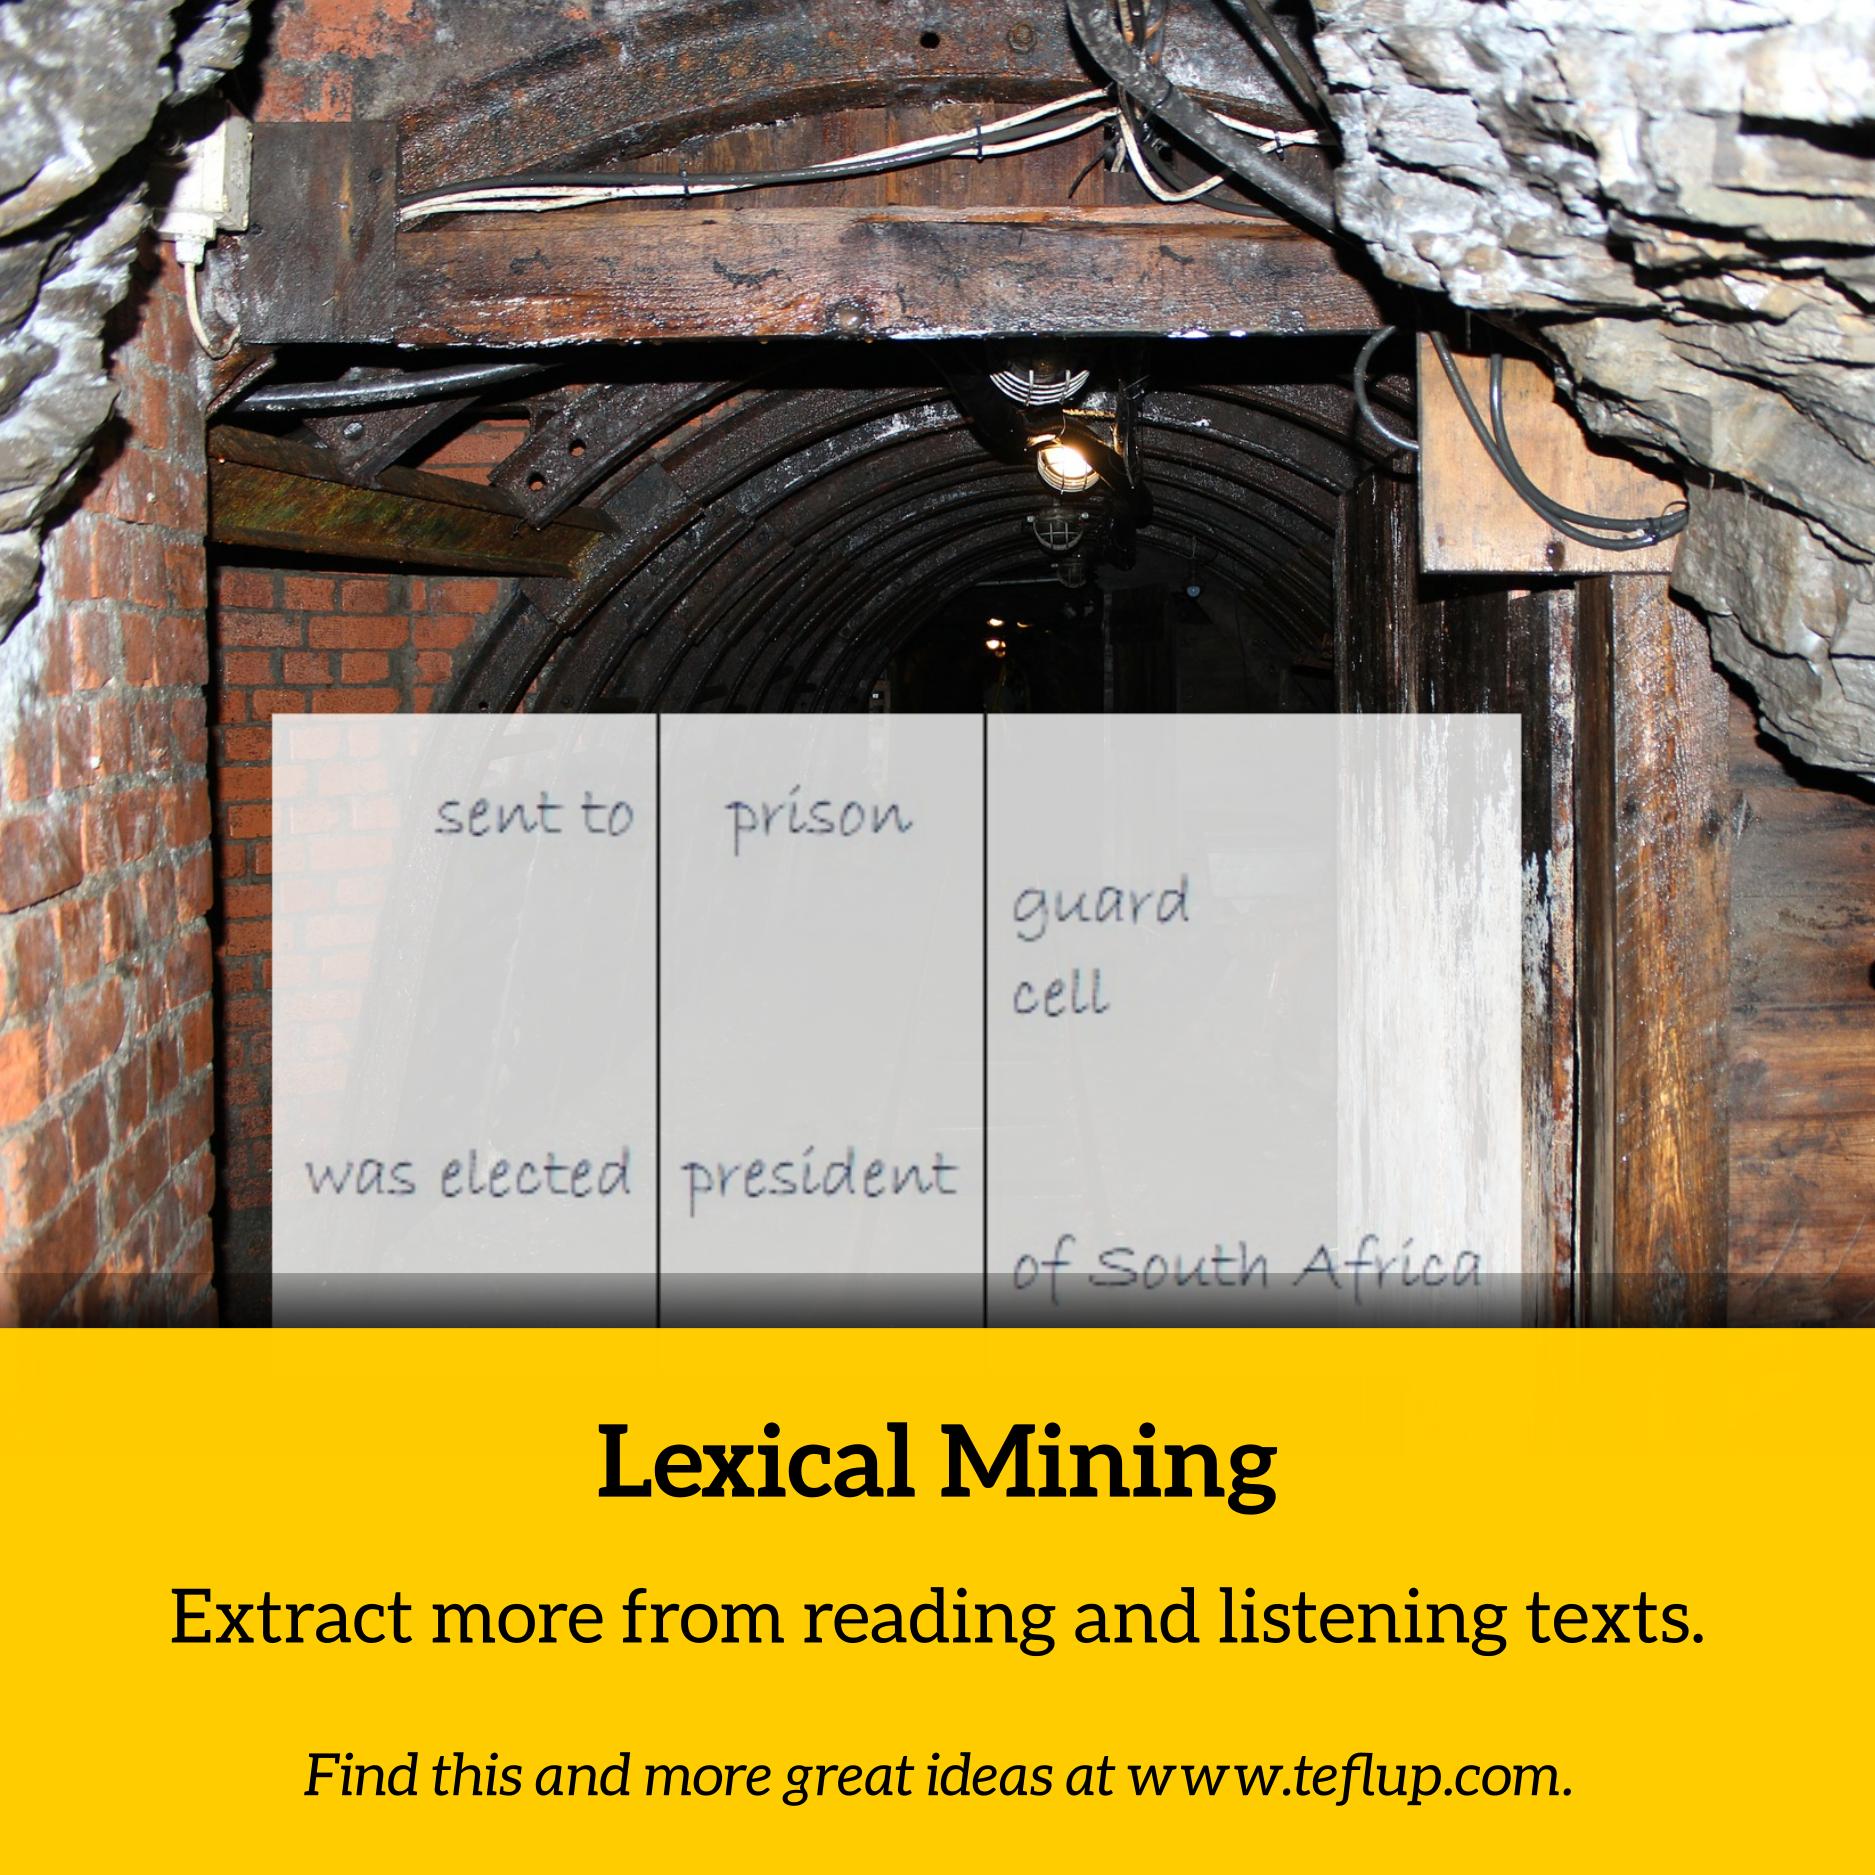 lexical mining